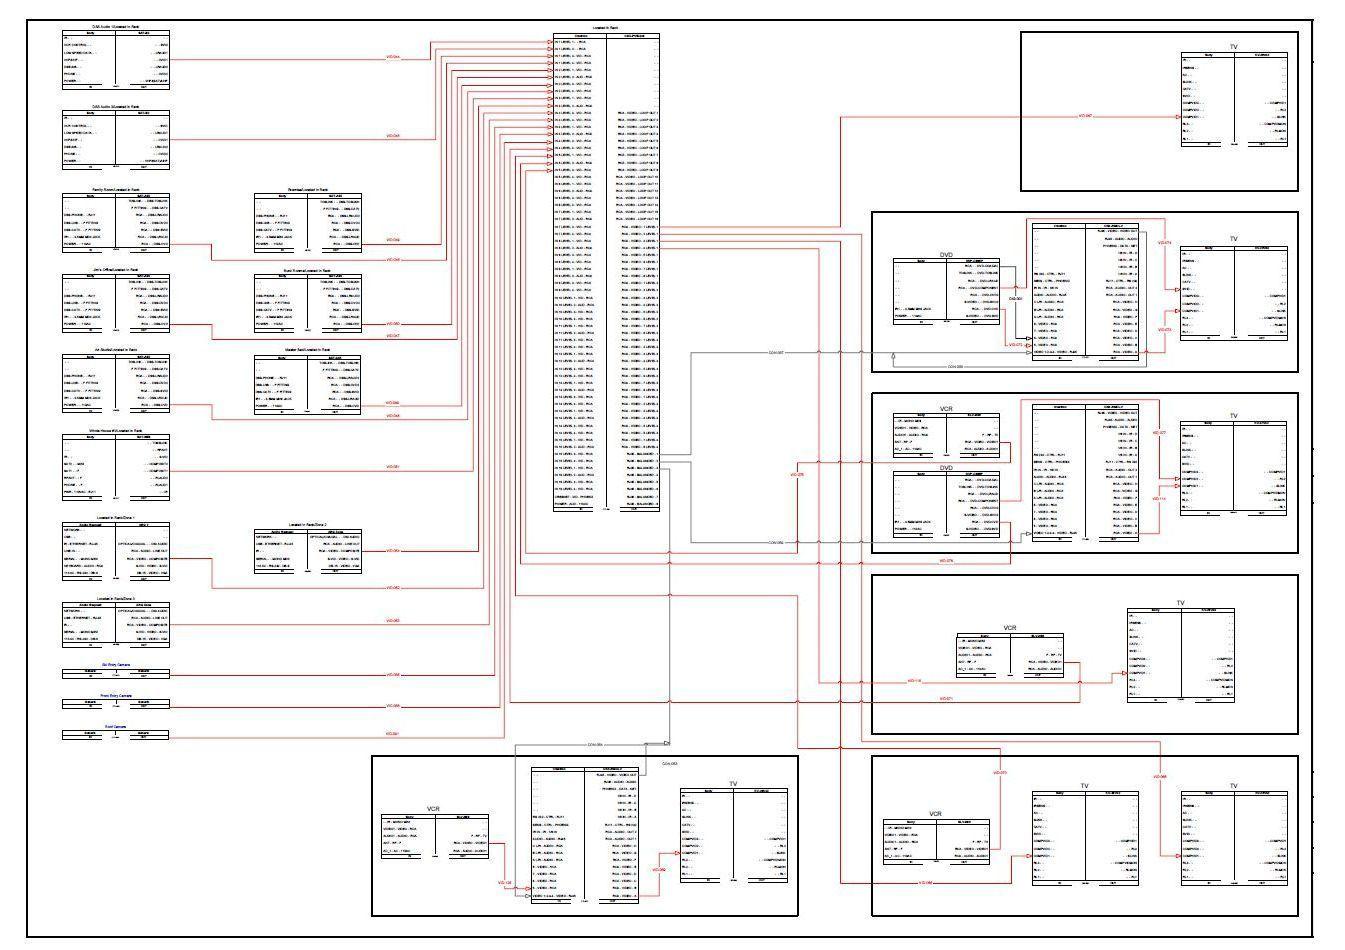 Проект дома на две семьи - один дом, две квартиры - DOM4M